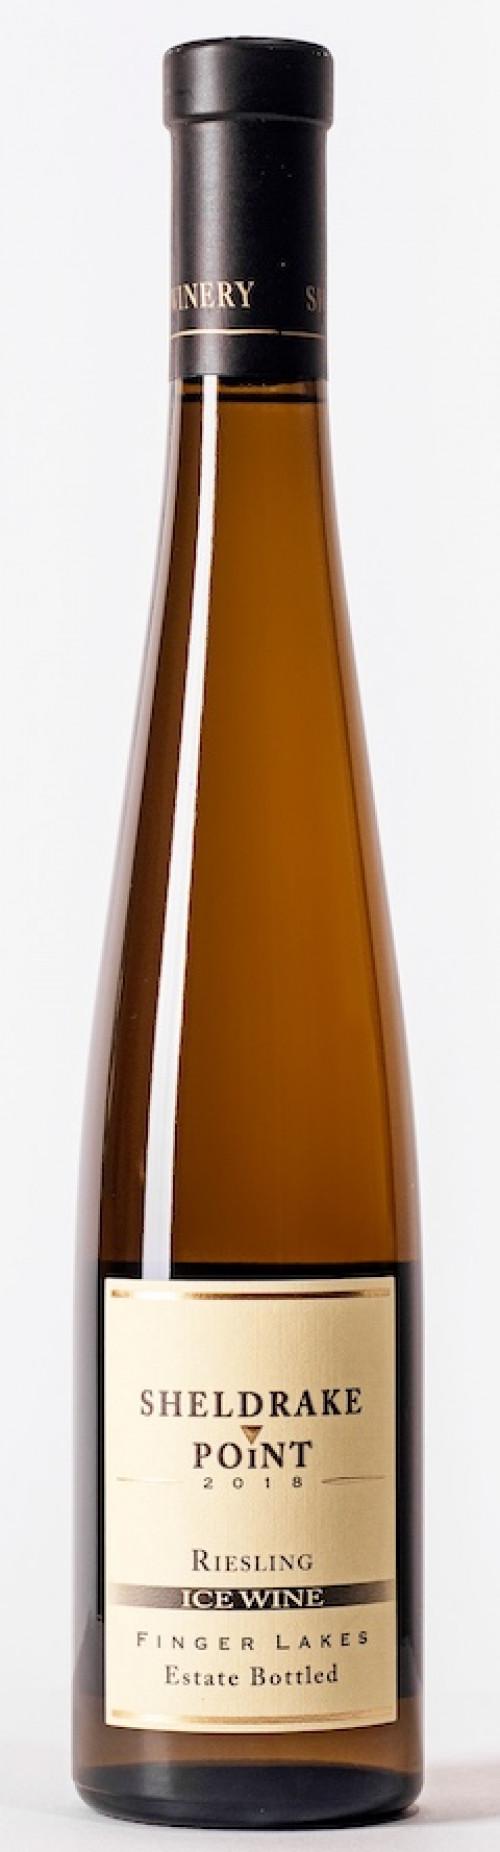 2018 Sheldrake Riesling Ice Wine 375ml